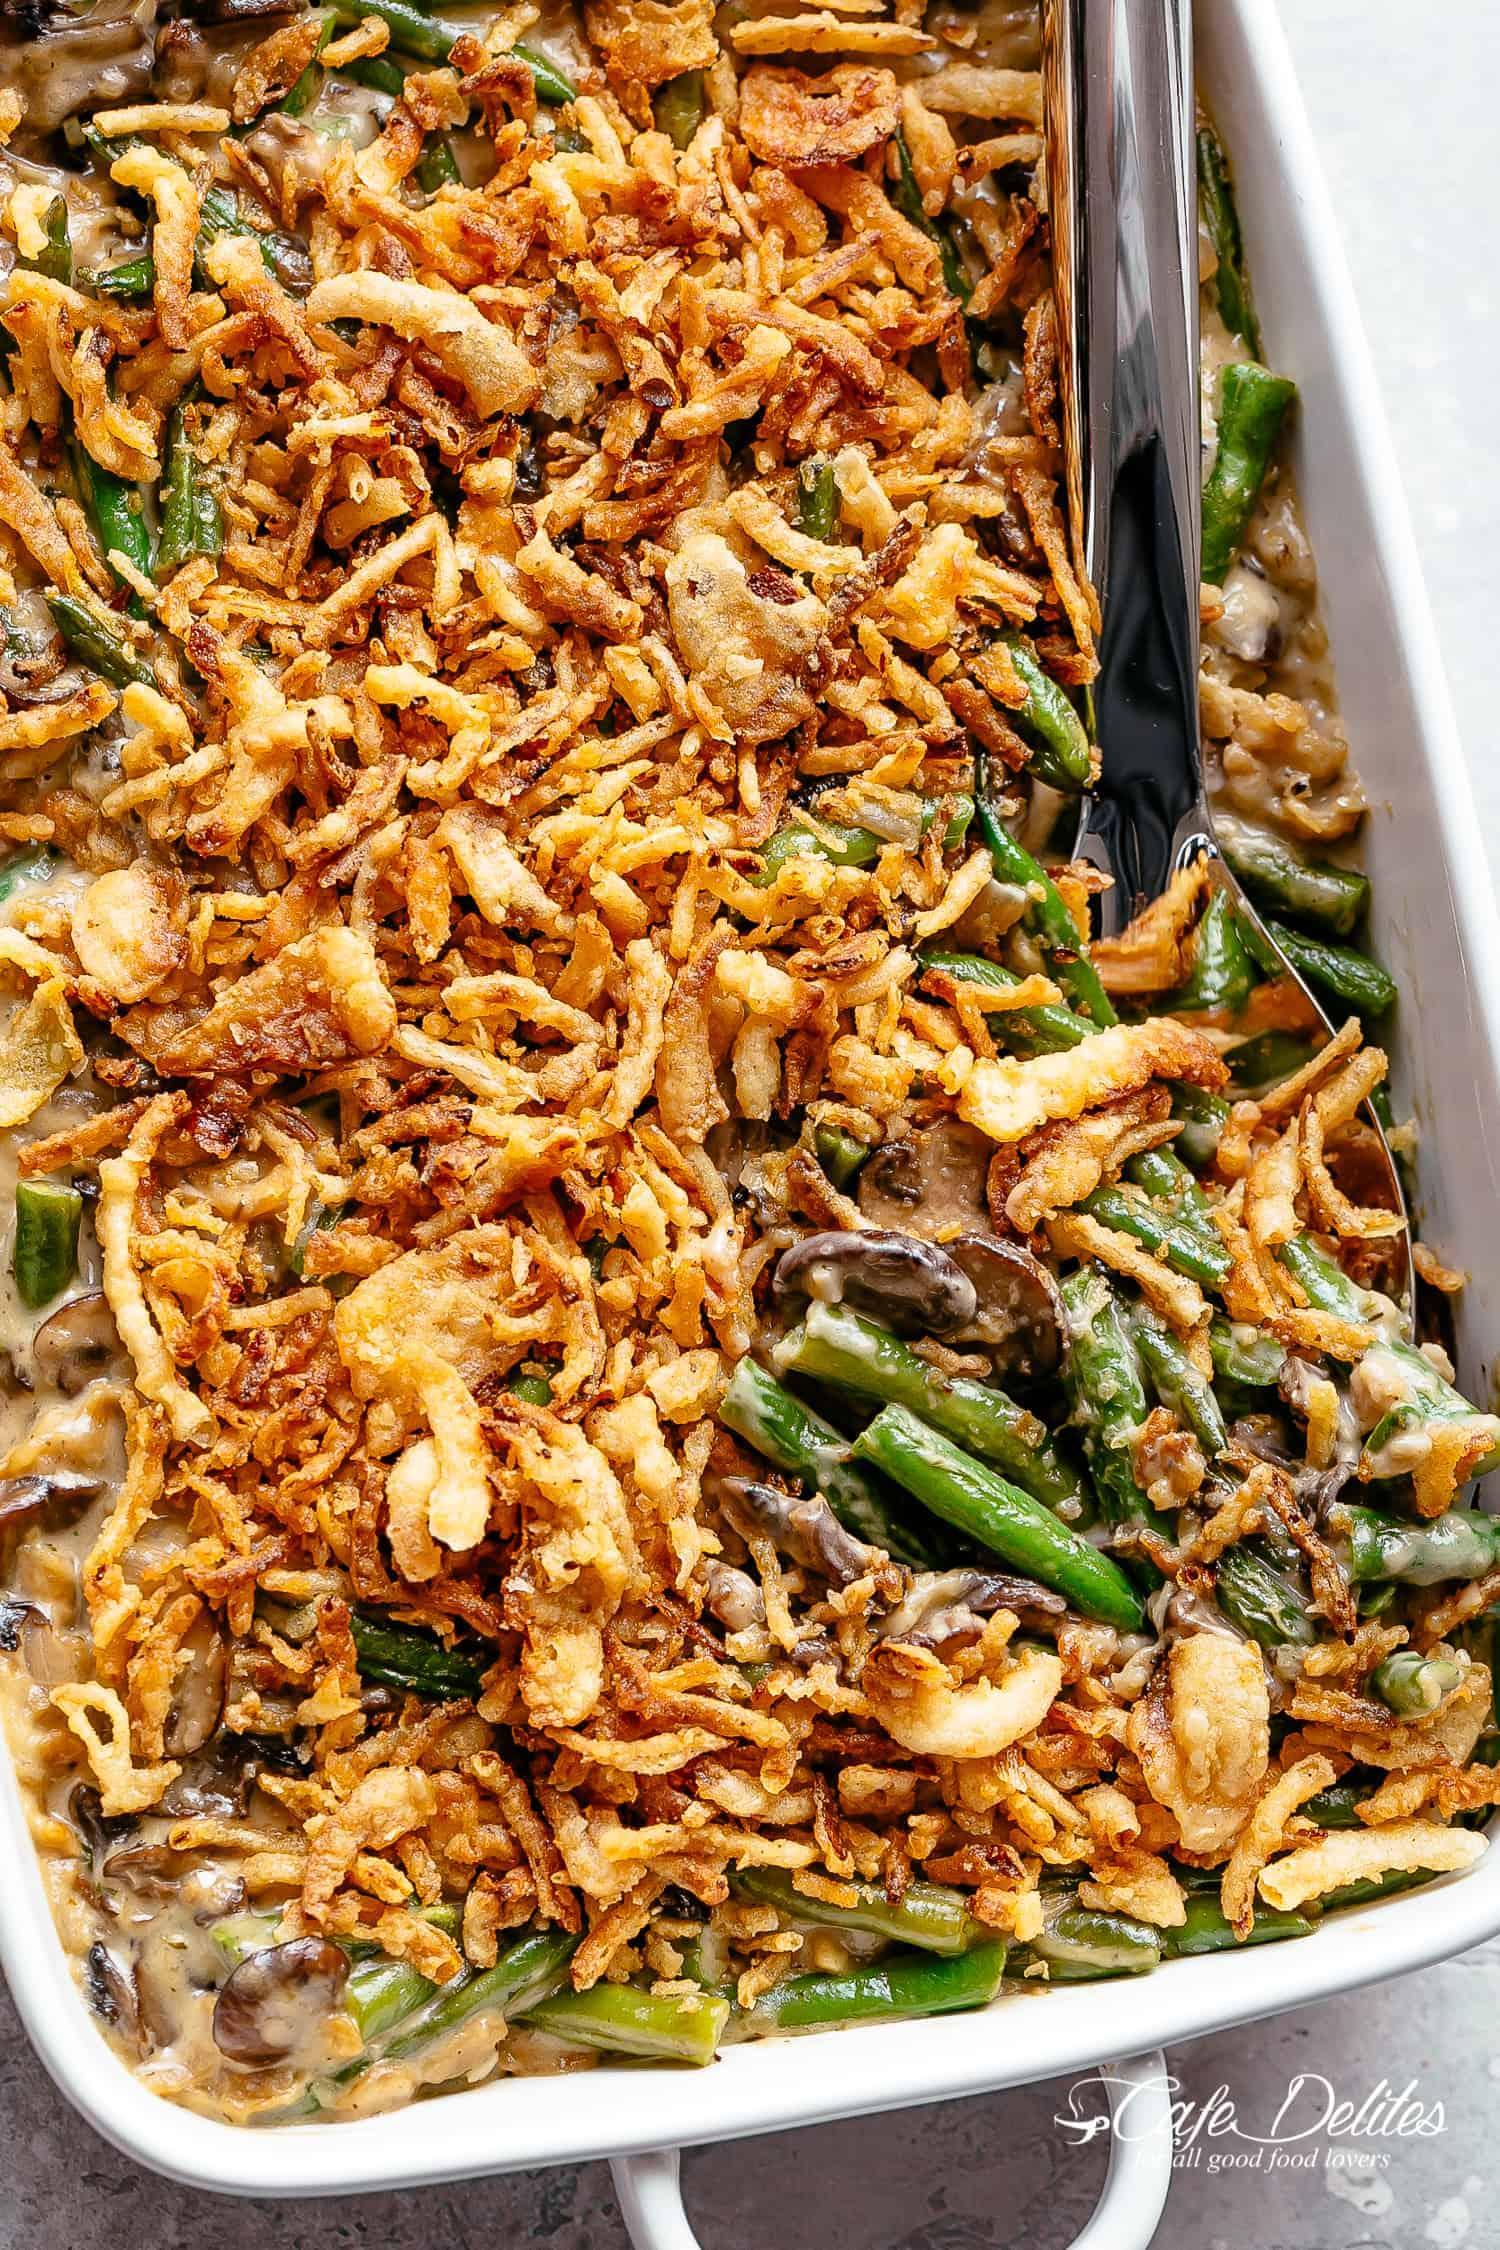 Green Bean Casserole in a baking dish #cafedelites #greenbeancasserole #thanksgiving #greens #sides #sidedish #casserole